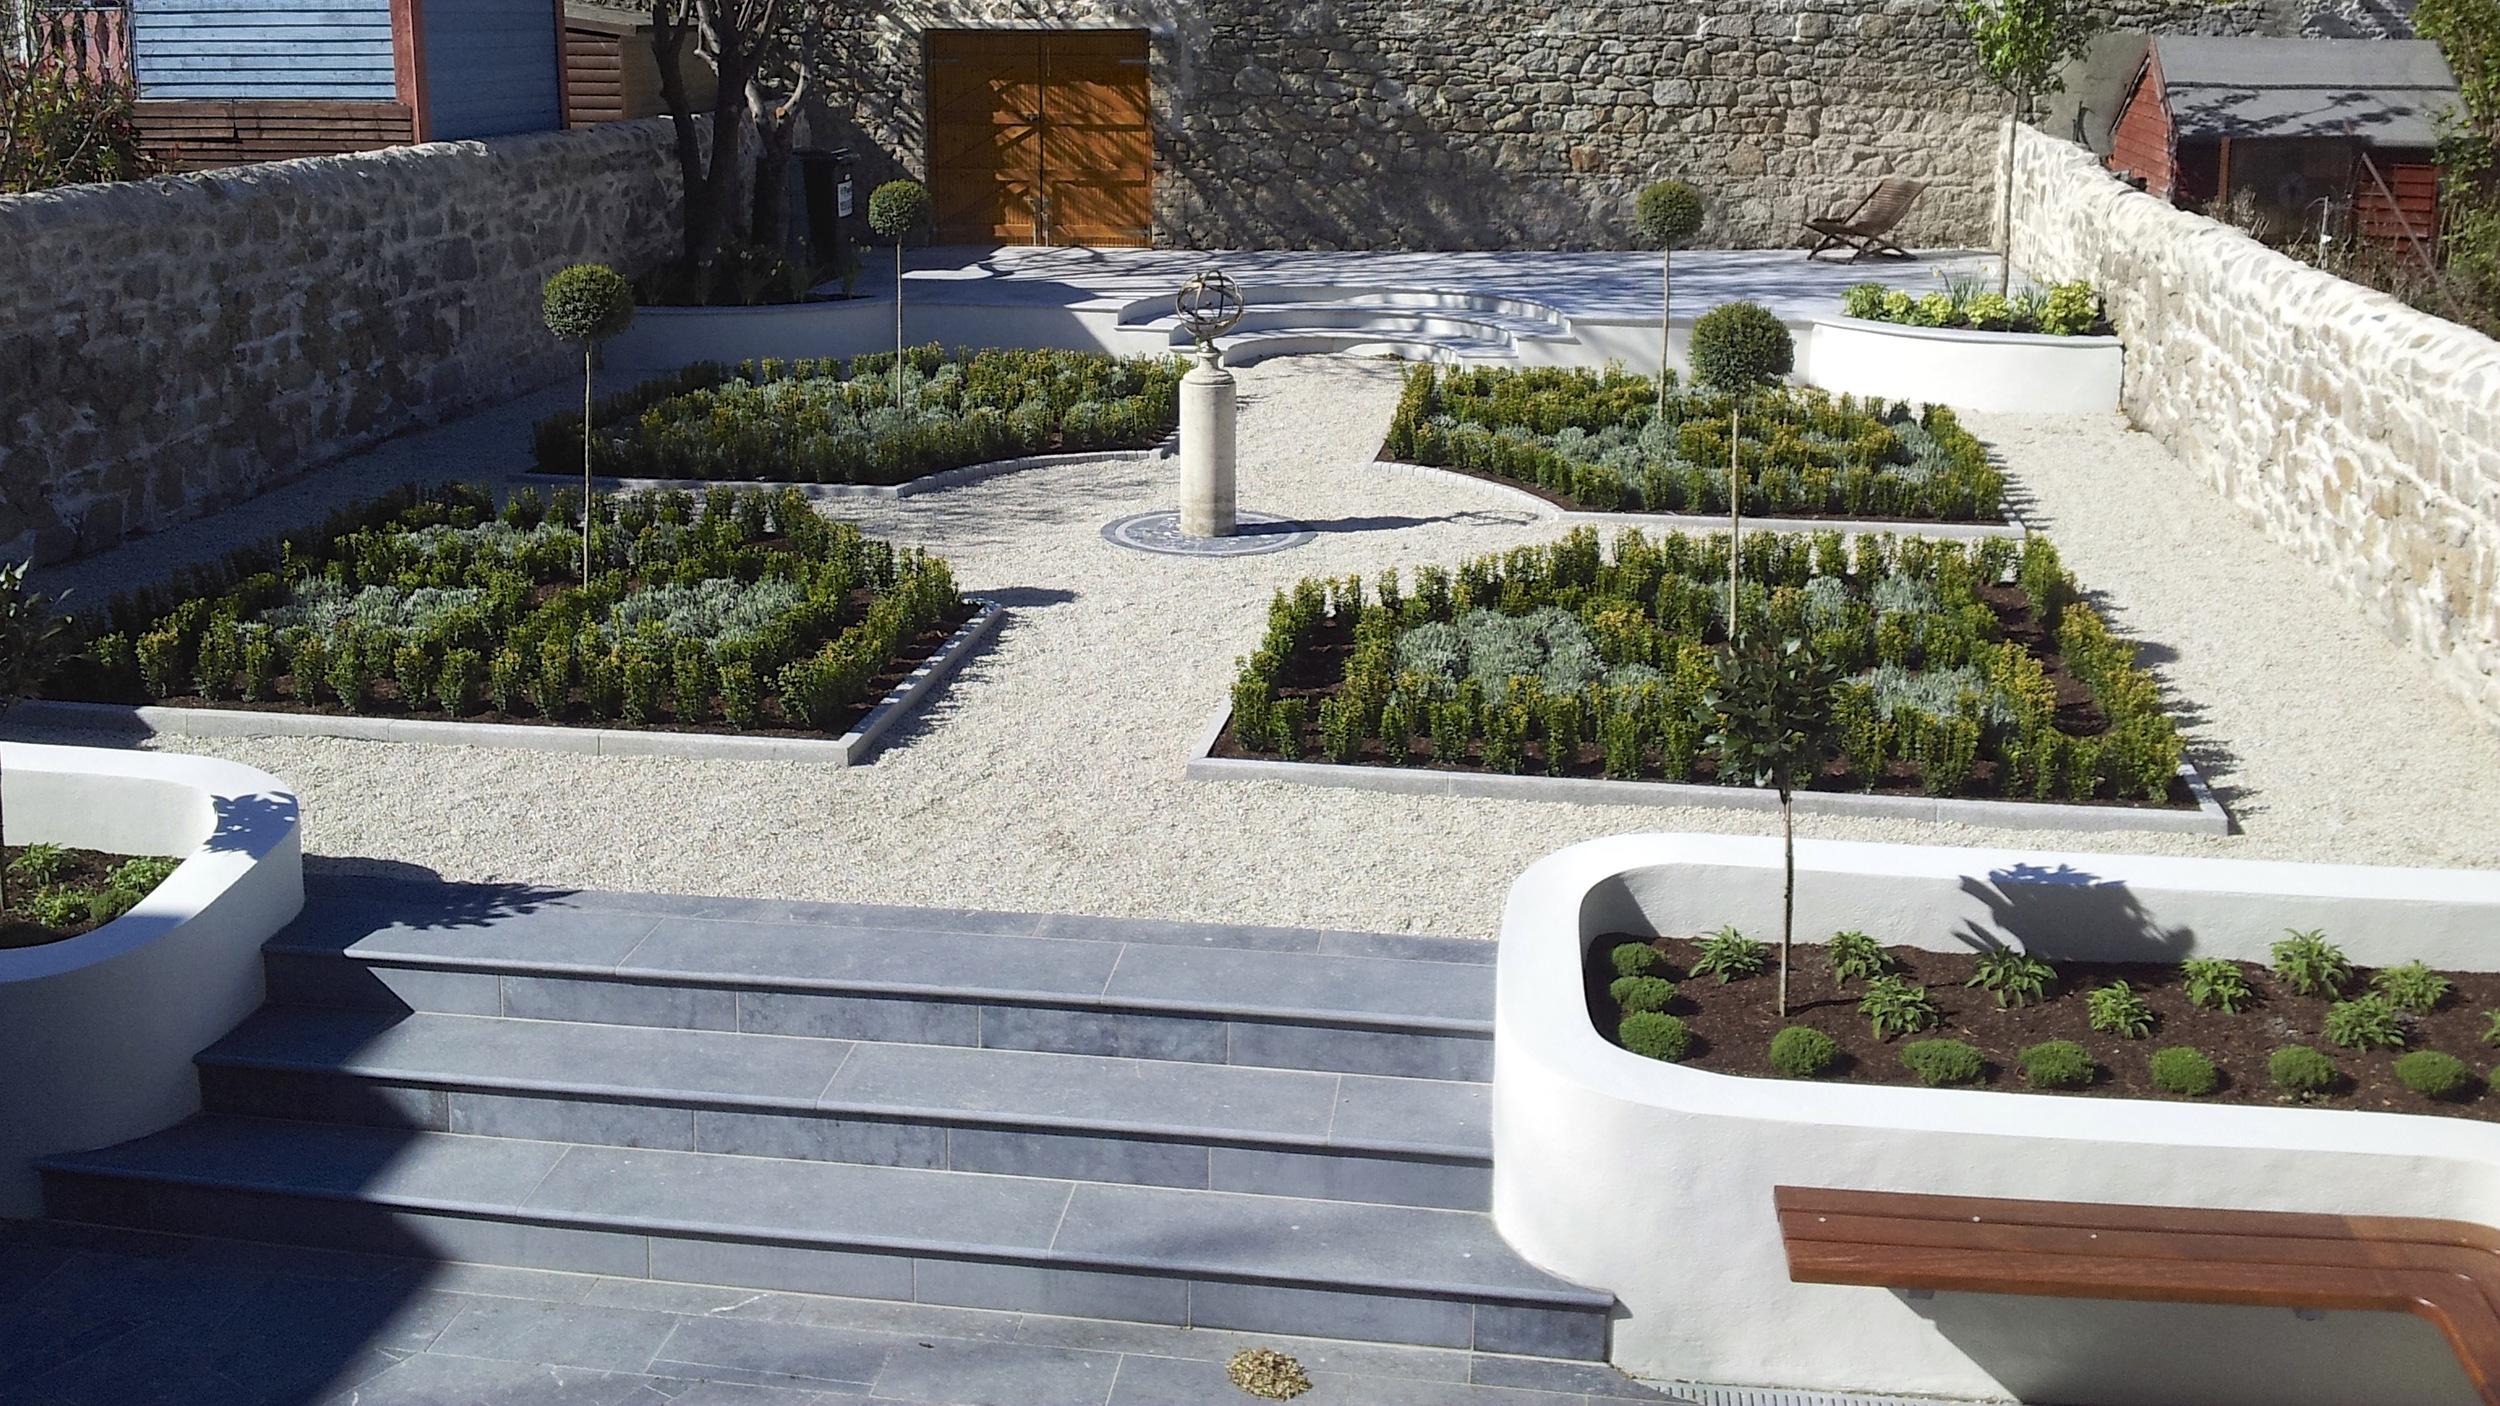 landscape restoration and classical garden designjpg